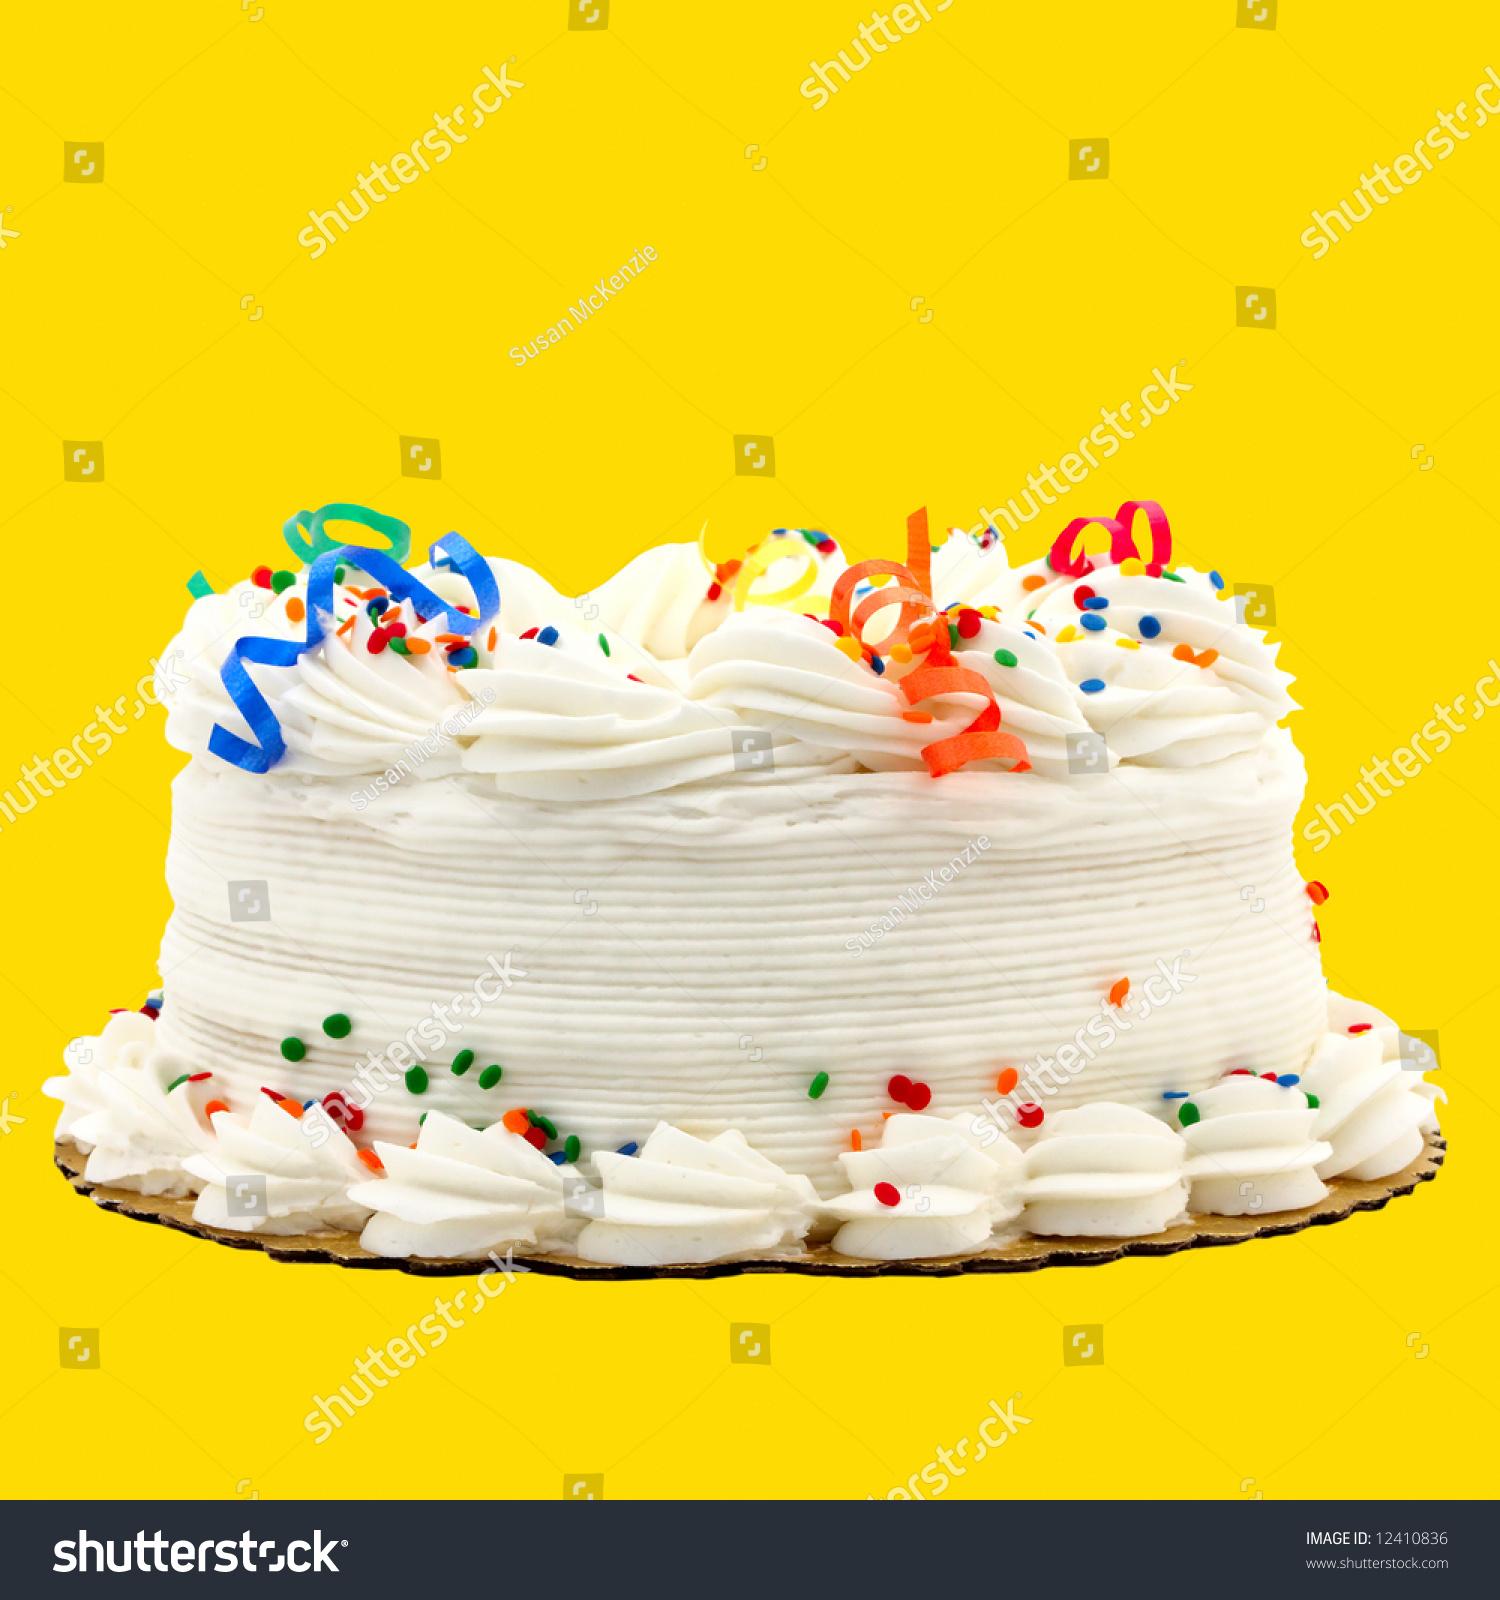 Delicious White Vanilla Birthday Cake Red Stock Photo